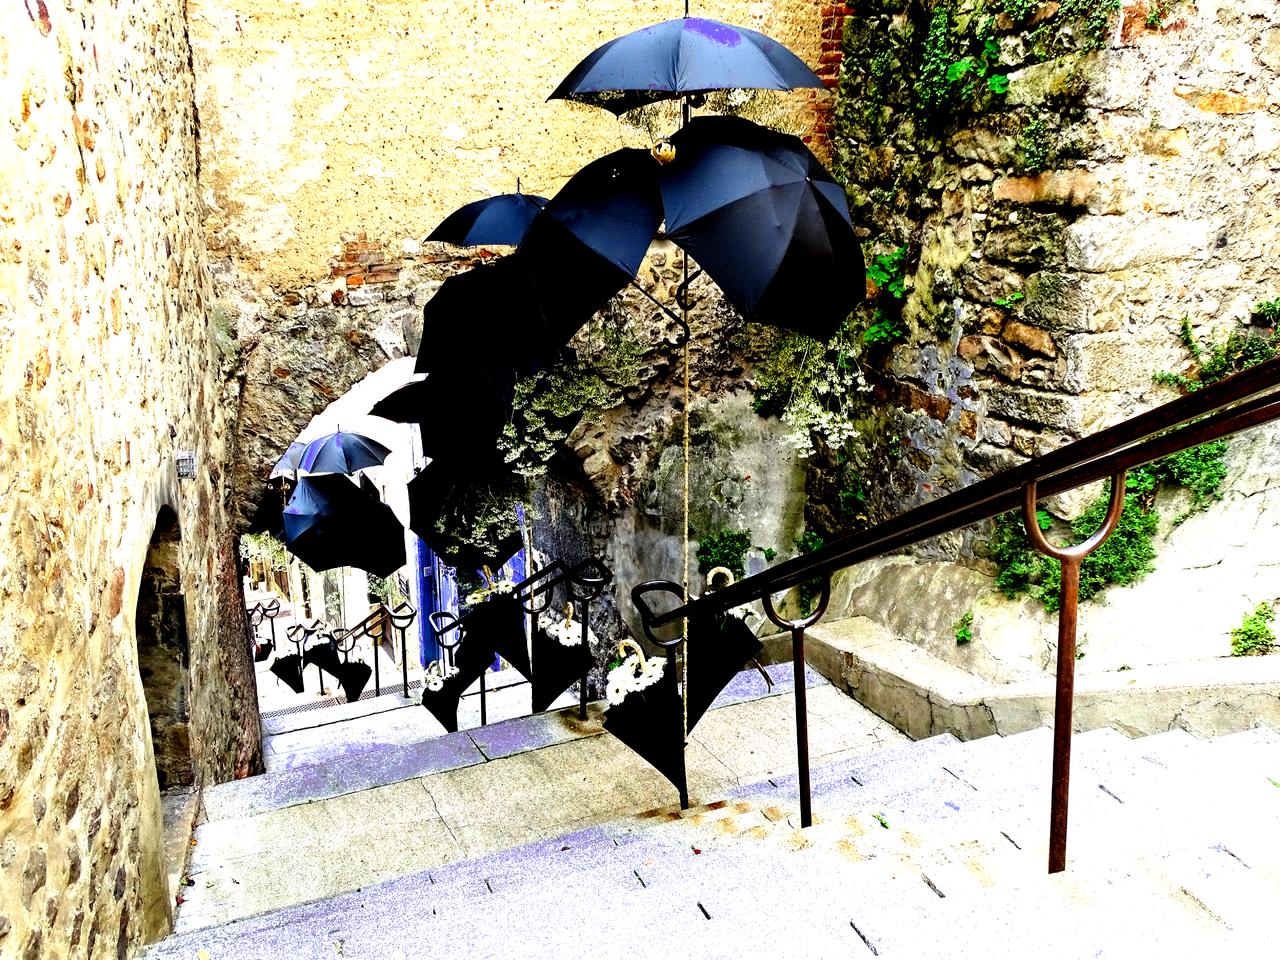 Chapiteau Umbrella